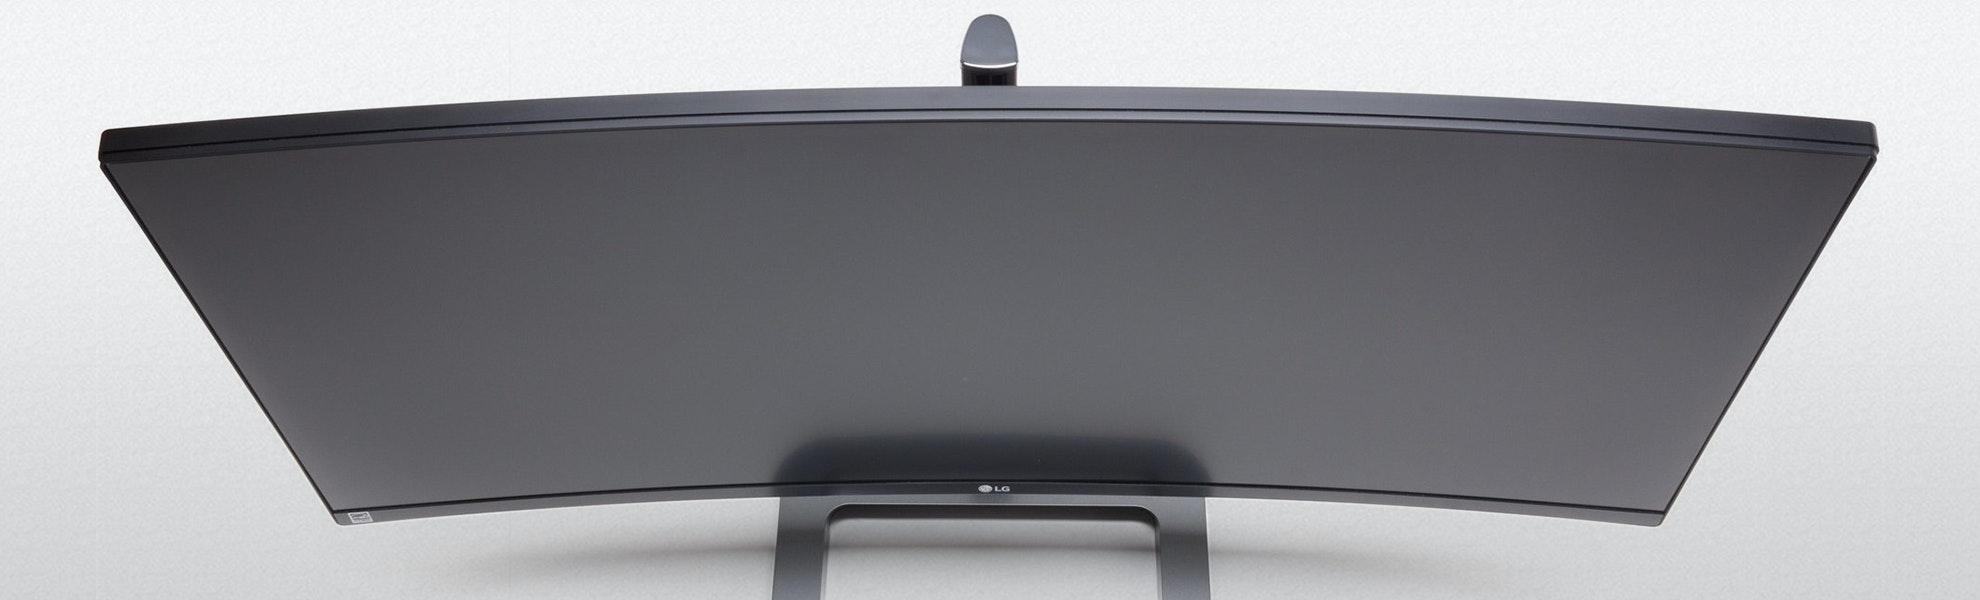 LG 34-inch Curved Ultrawide Monitor 34UC87M-B